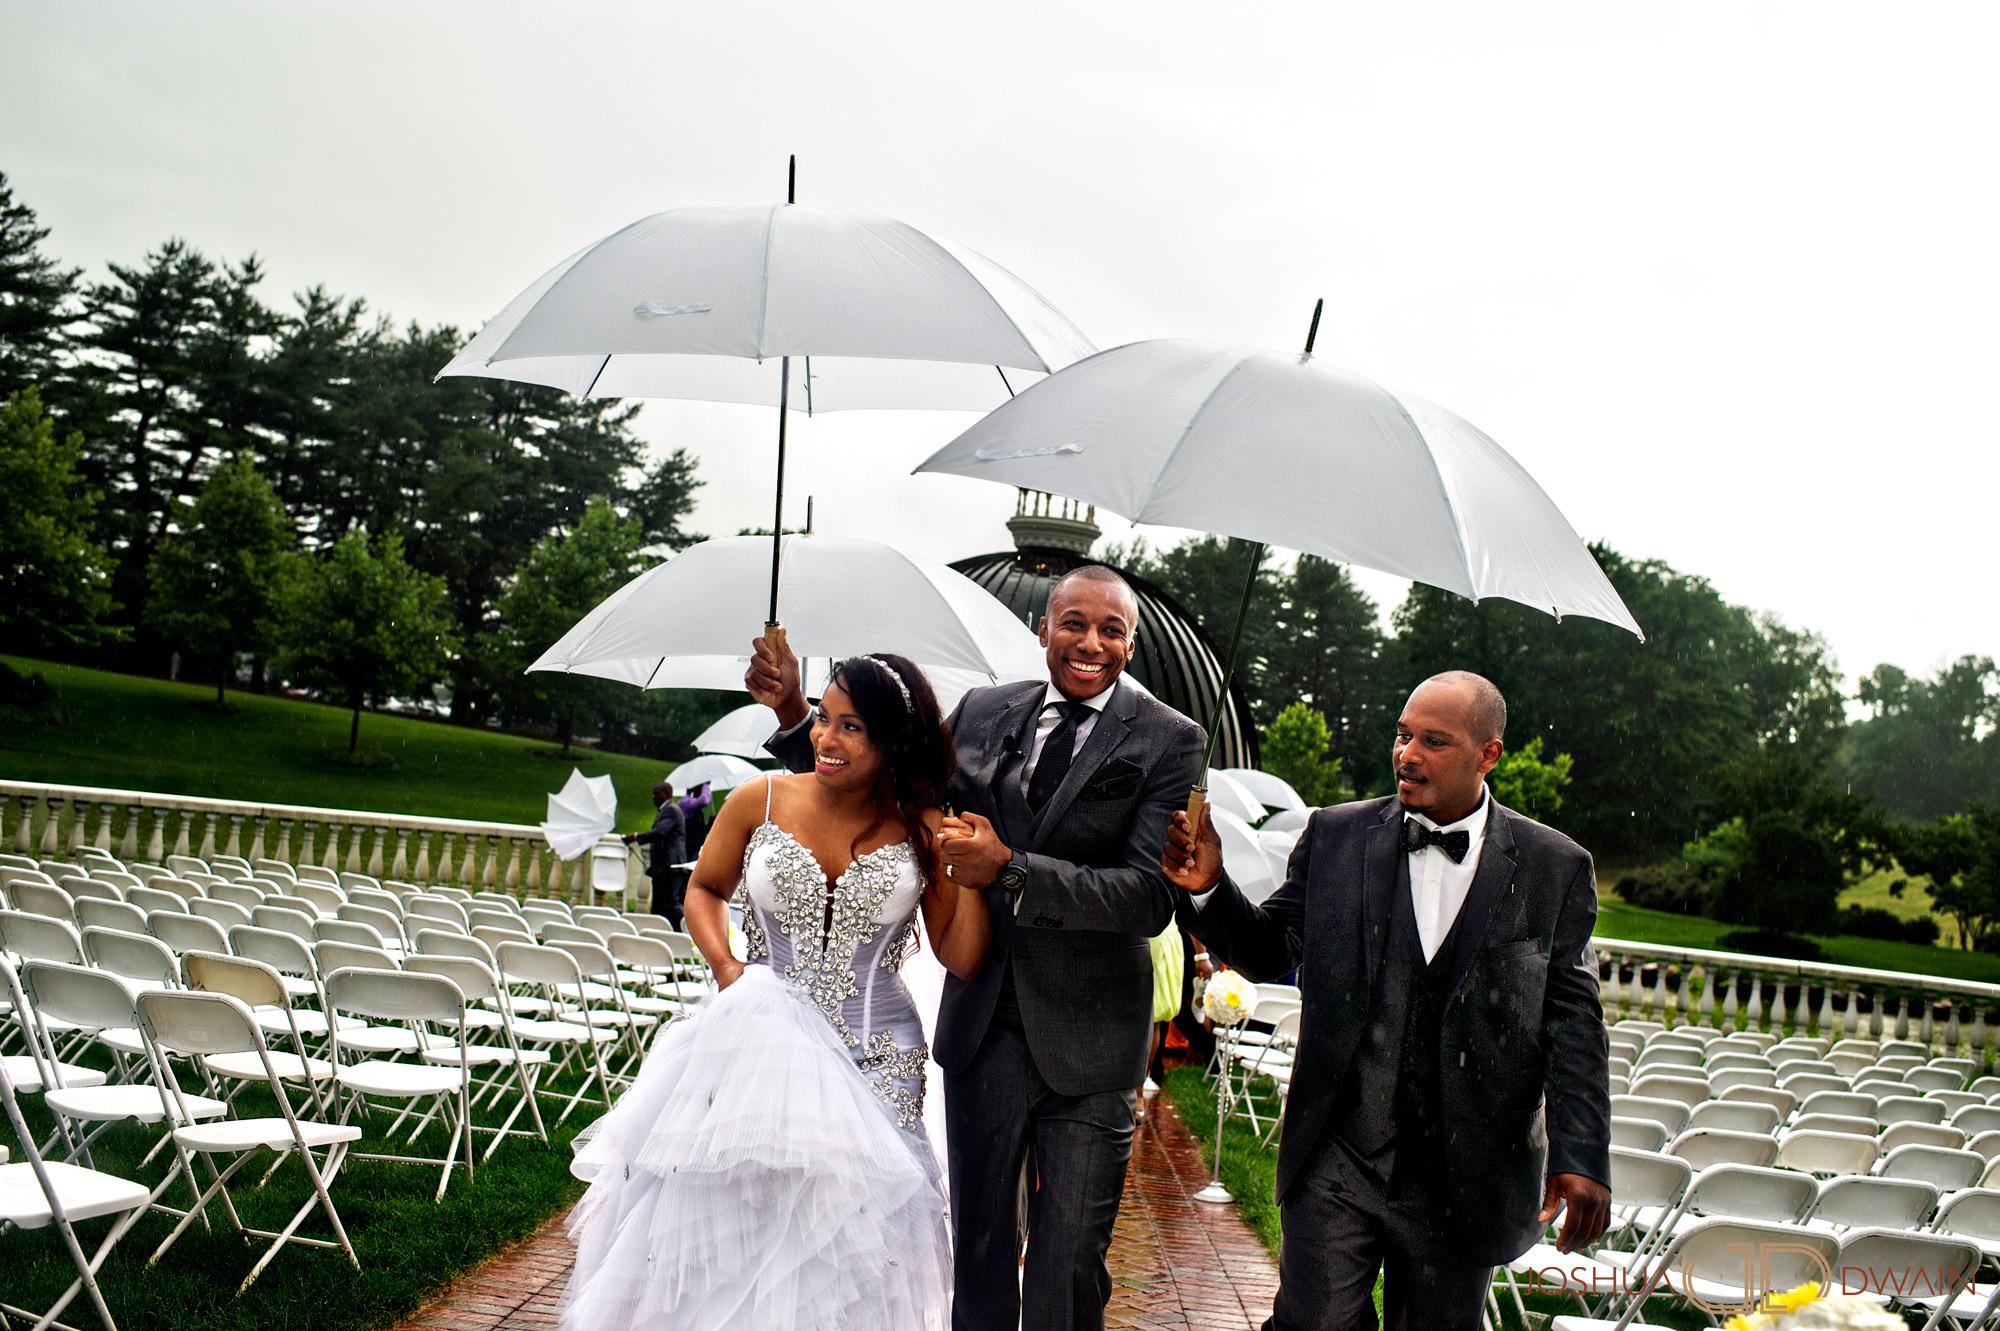 cadisha-antoine-010-ashford-estates-allentown-nj-wedding-photographer-joshua-dwain-photography-